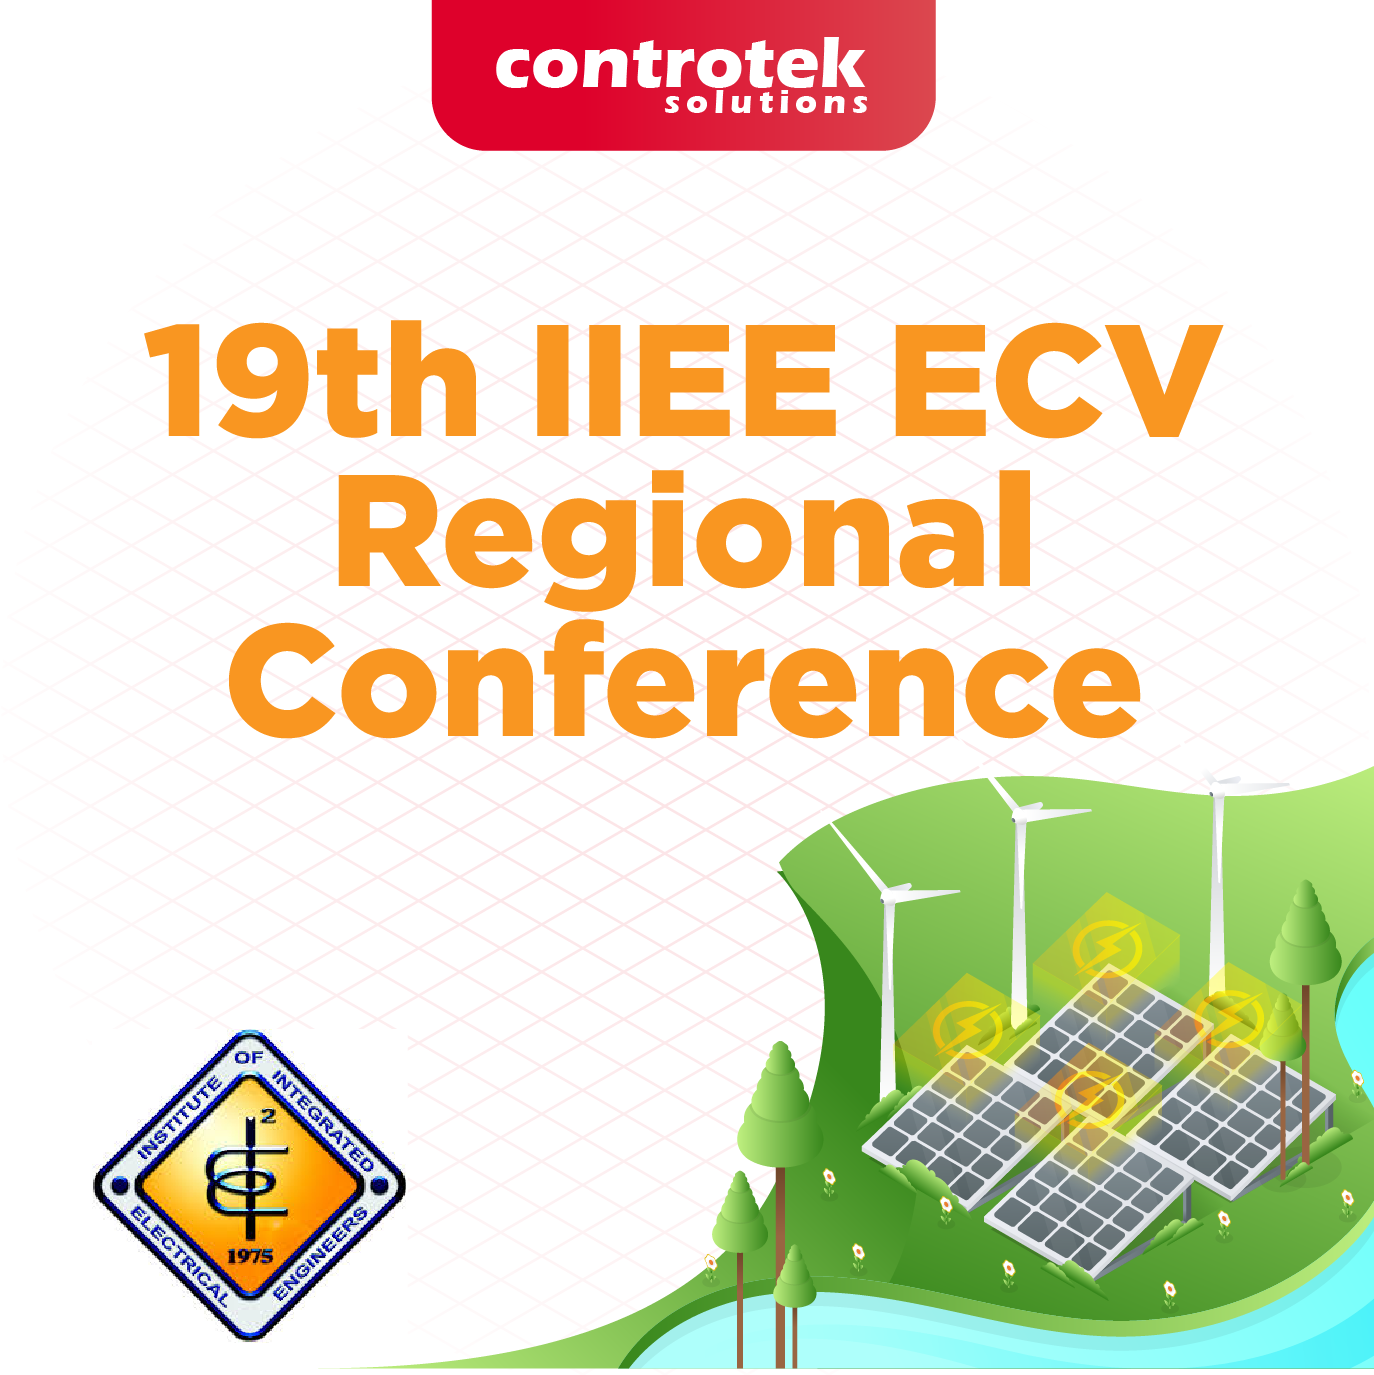 Controtek Solutions Joins 19th IIEE ECV Regional Convention - Bai Hotel, Cebu